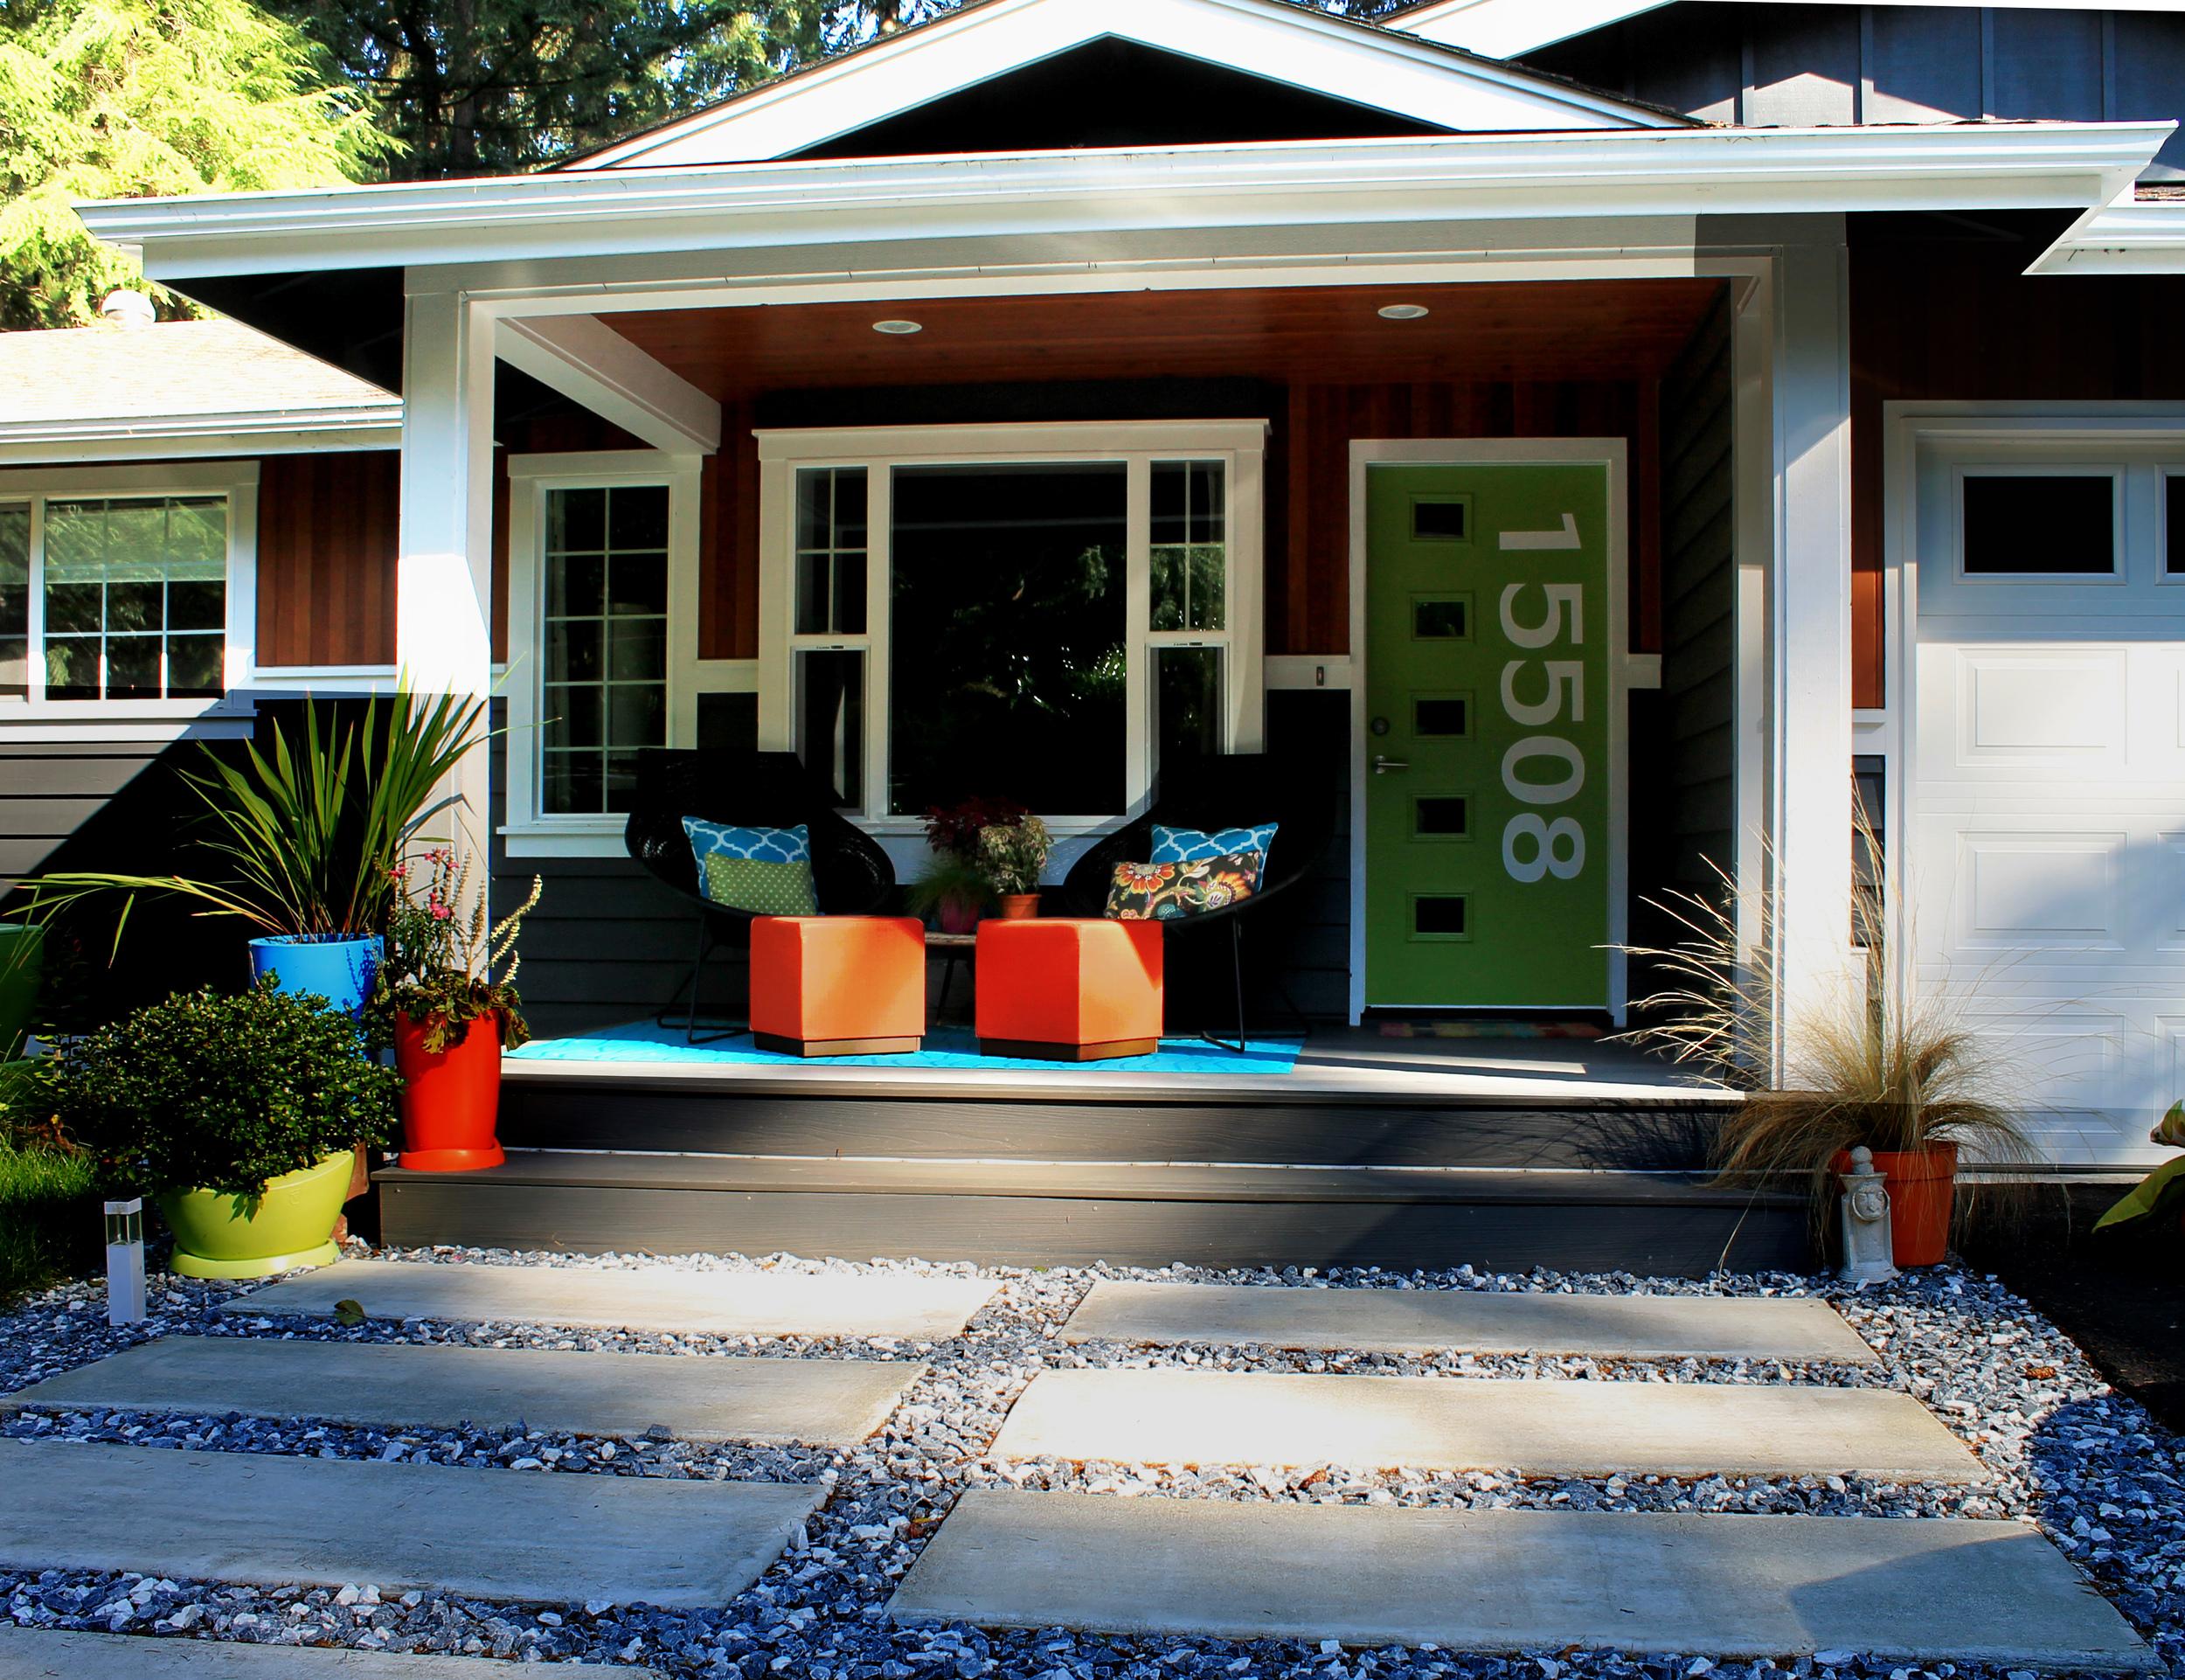 curb-appeal-front-door-makeover.jpg